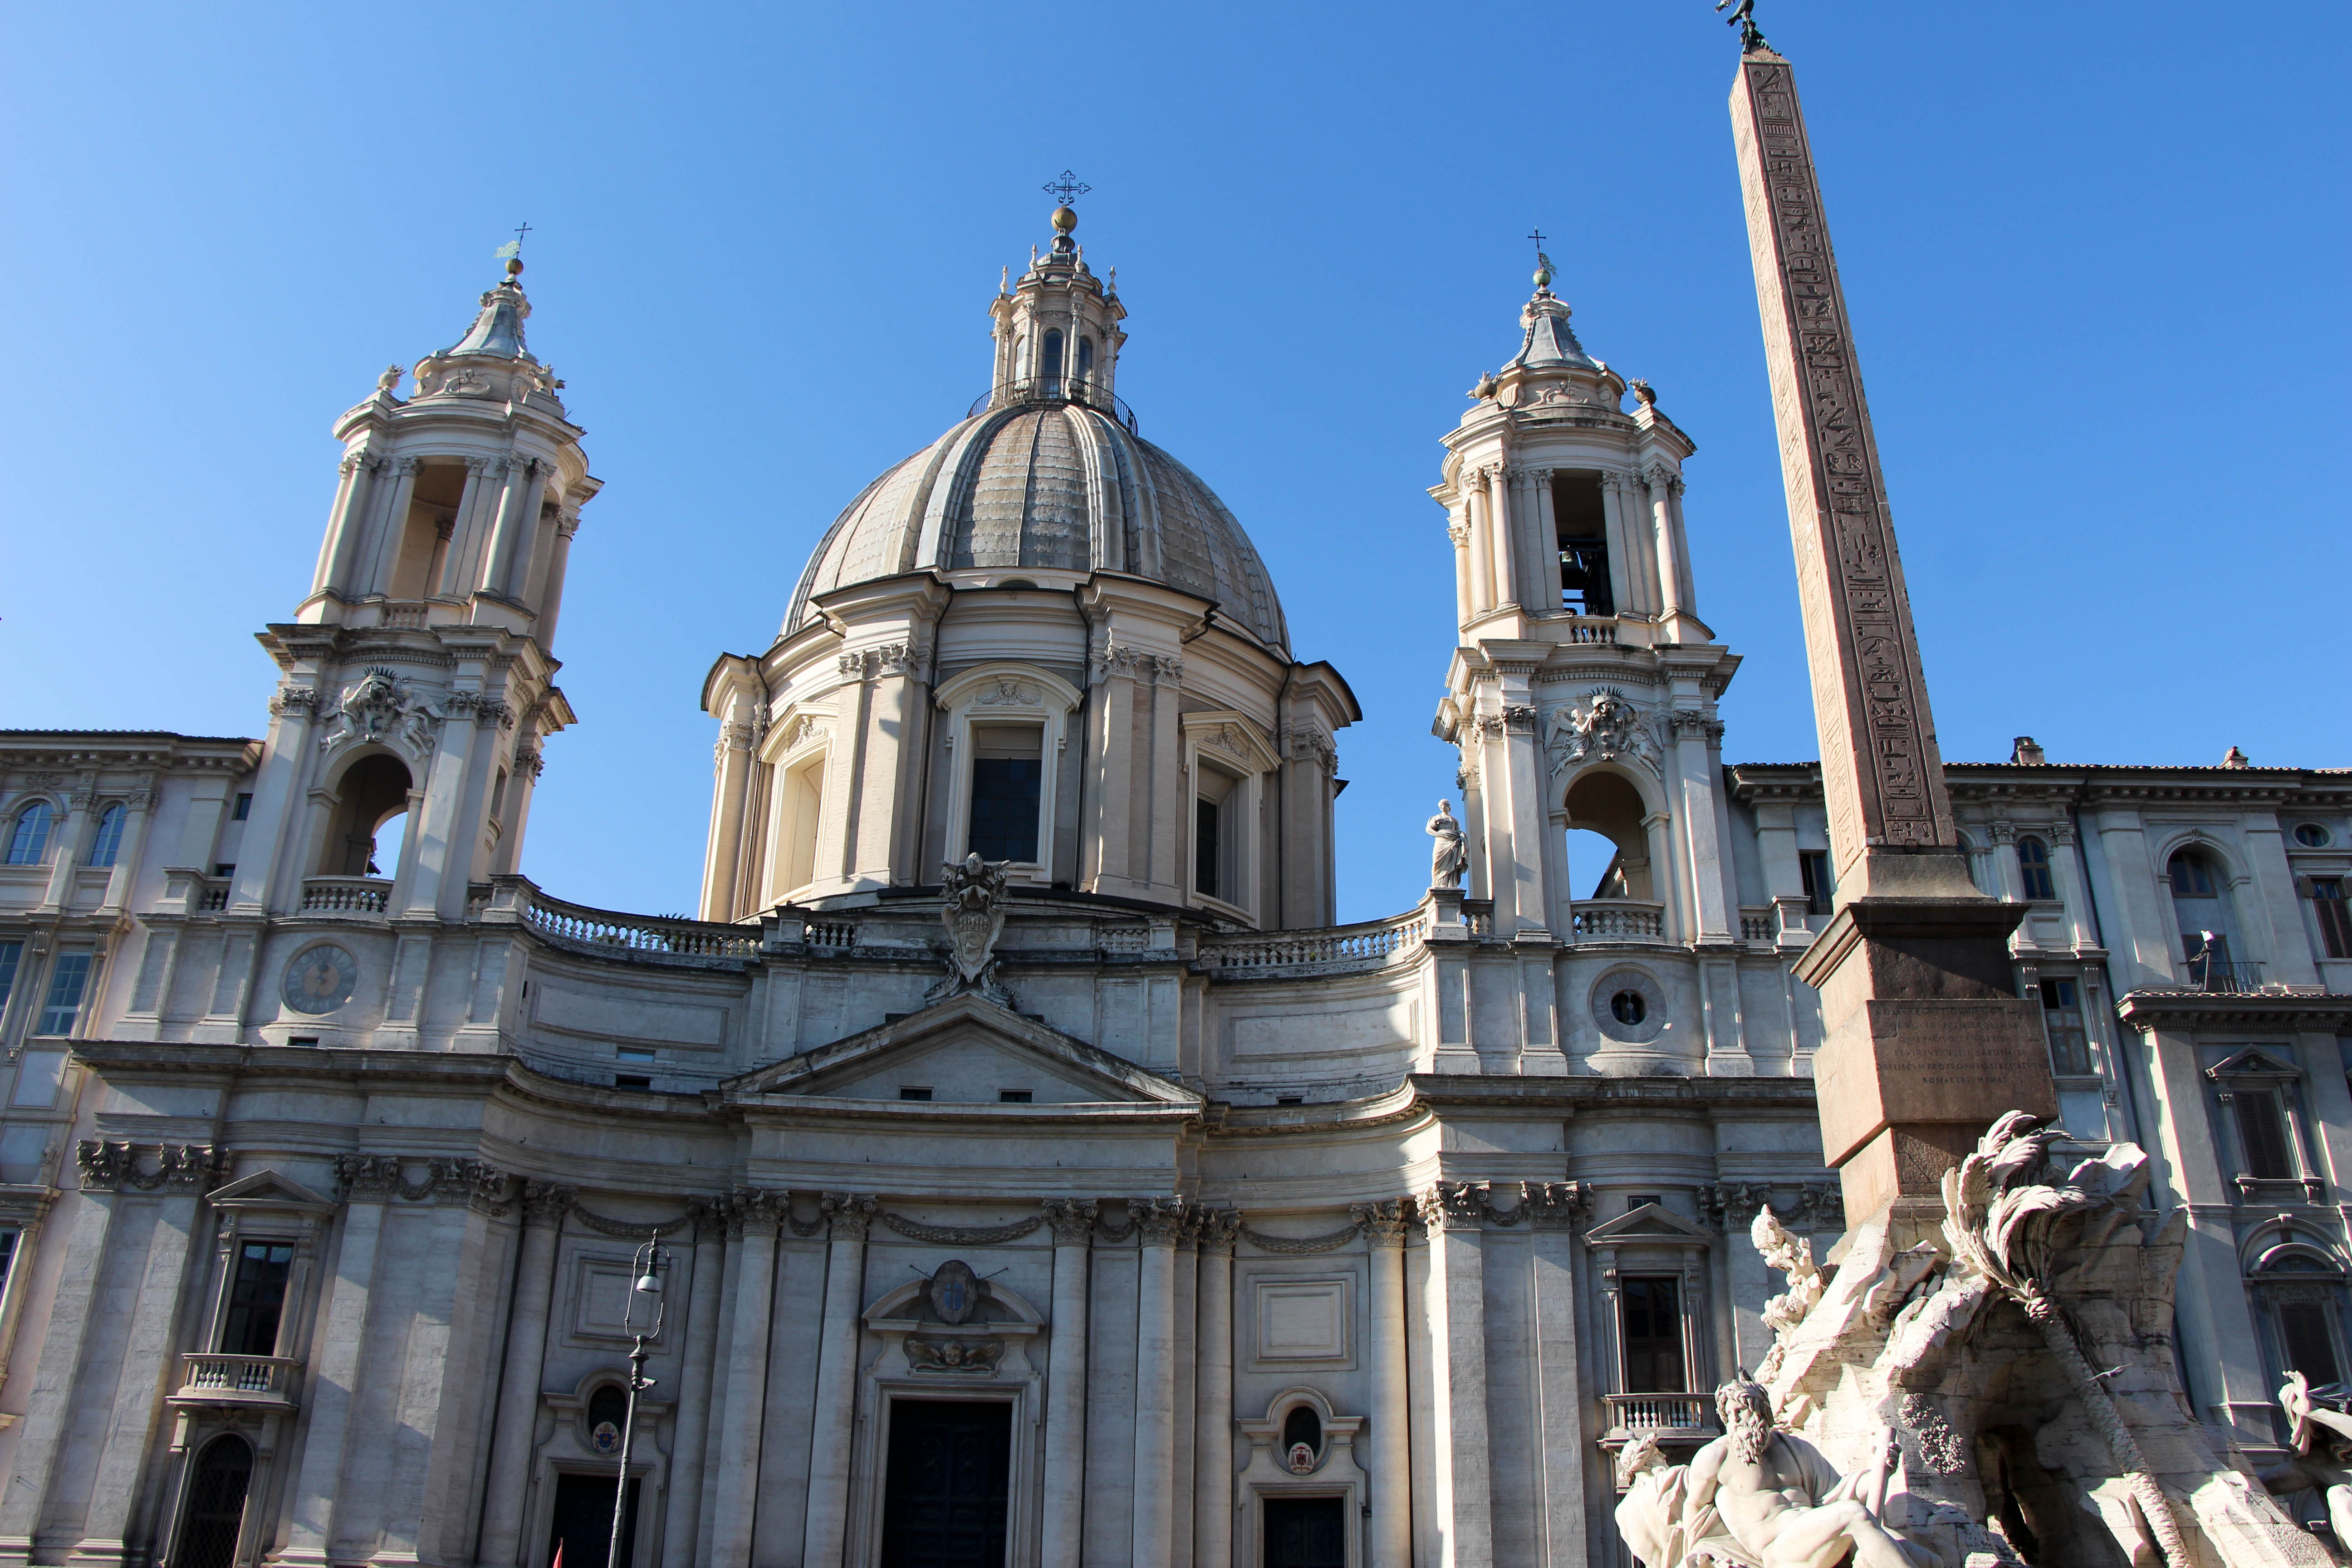 piazza-navona-eglise-rome